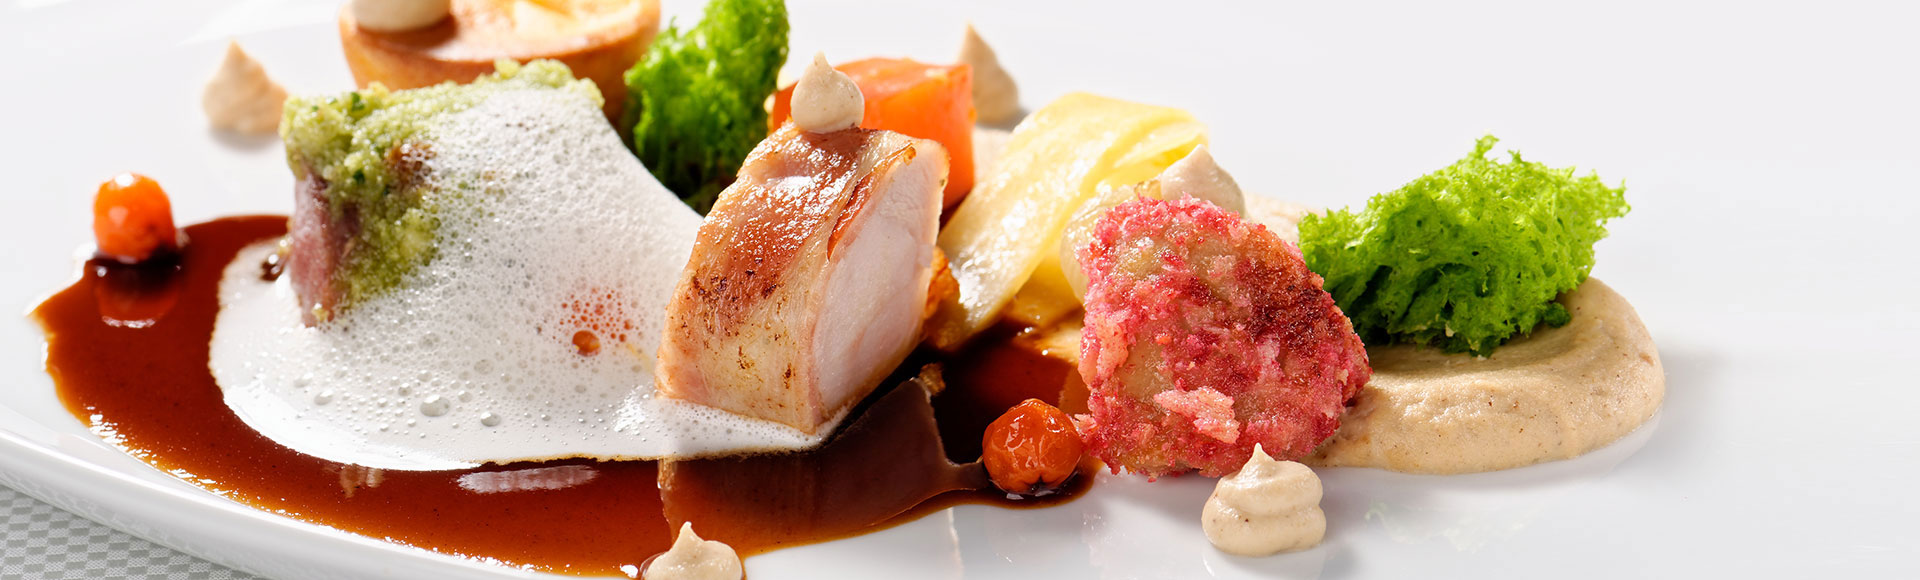 Kulinarik Flachau Hotel Alpenwelt 2